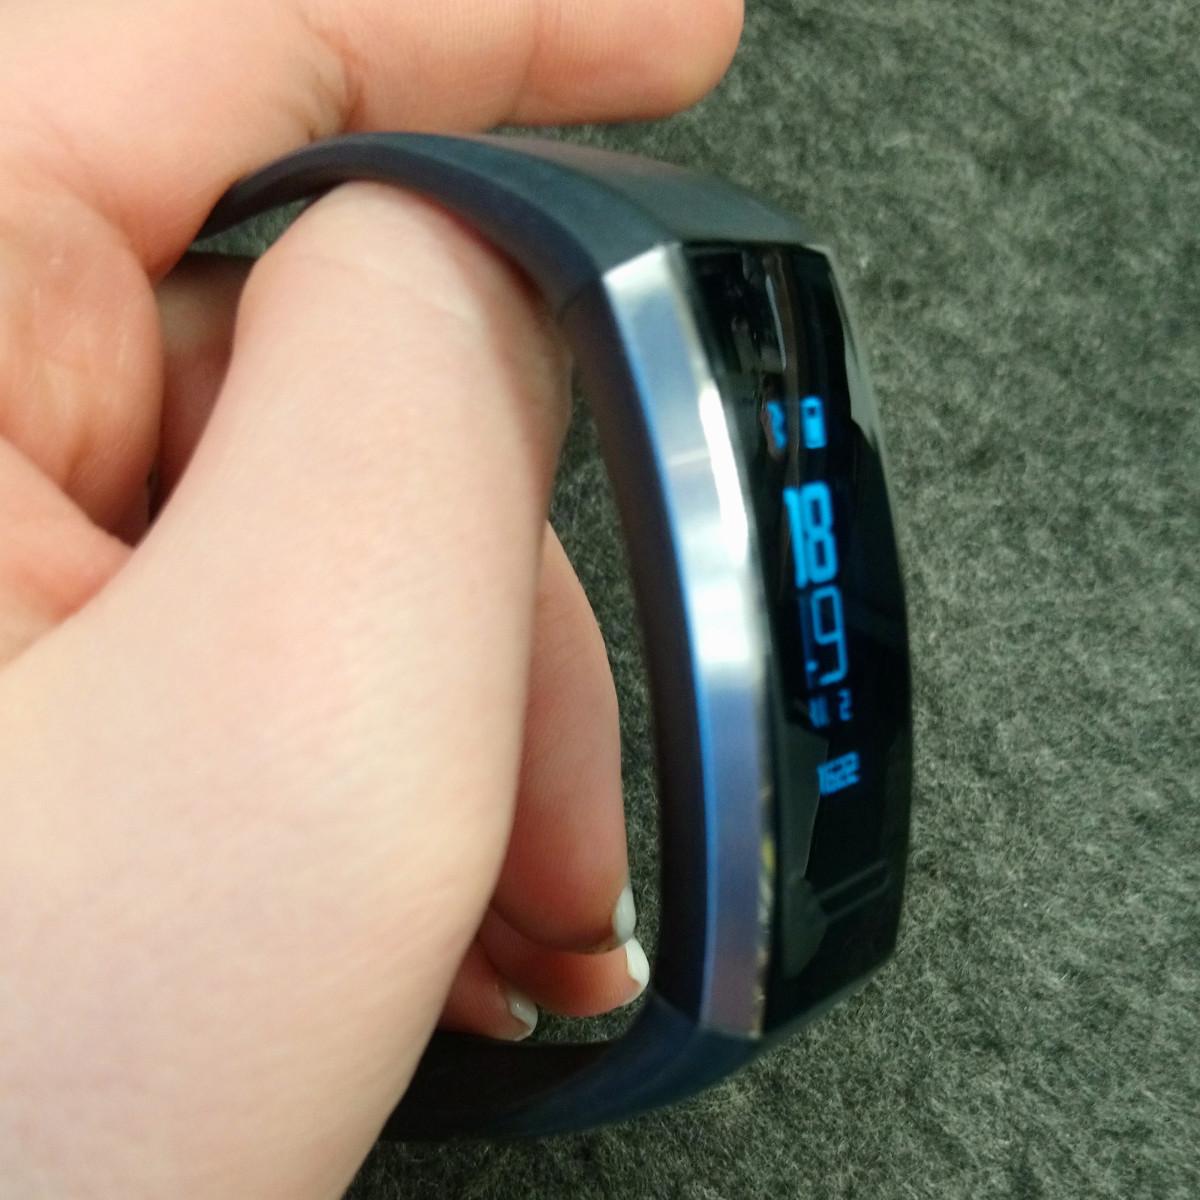 Huawei Band 2 Pro - Seitenansicht (Image by Jennifer Eilitz)